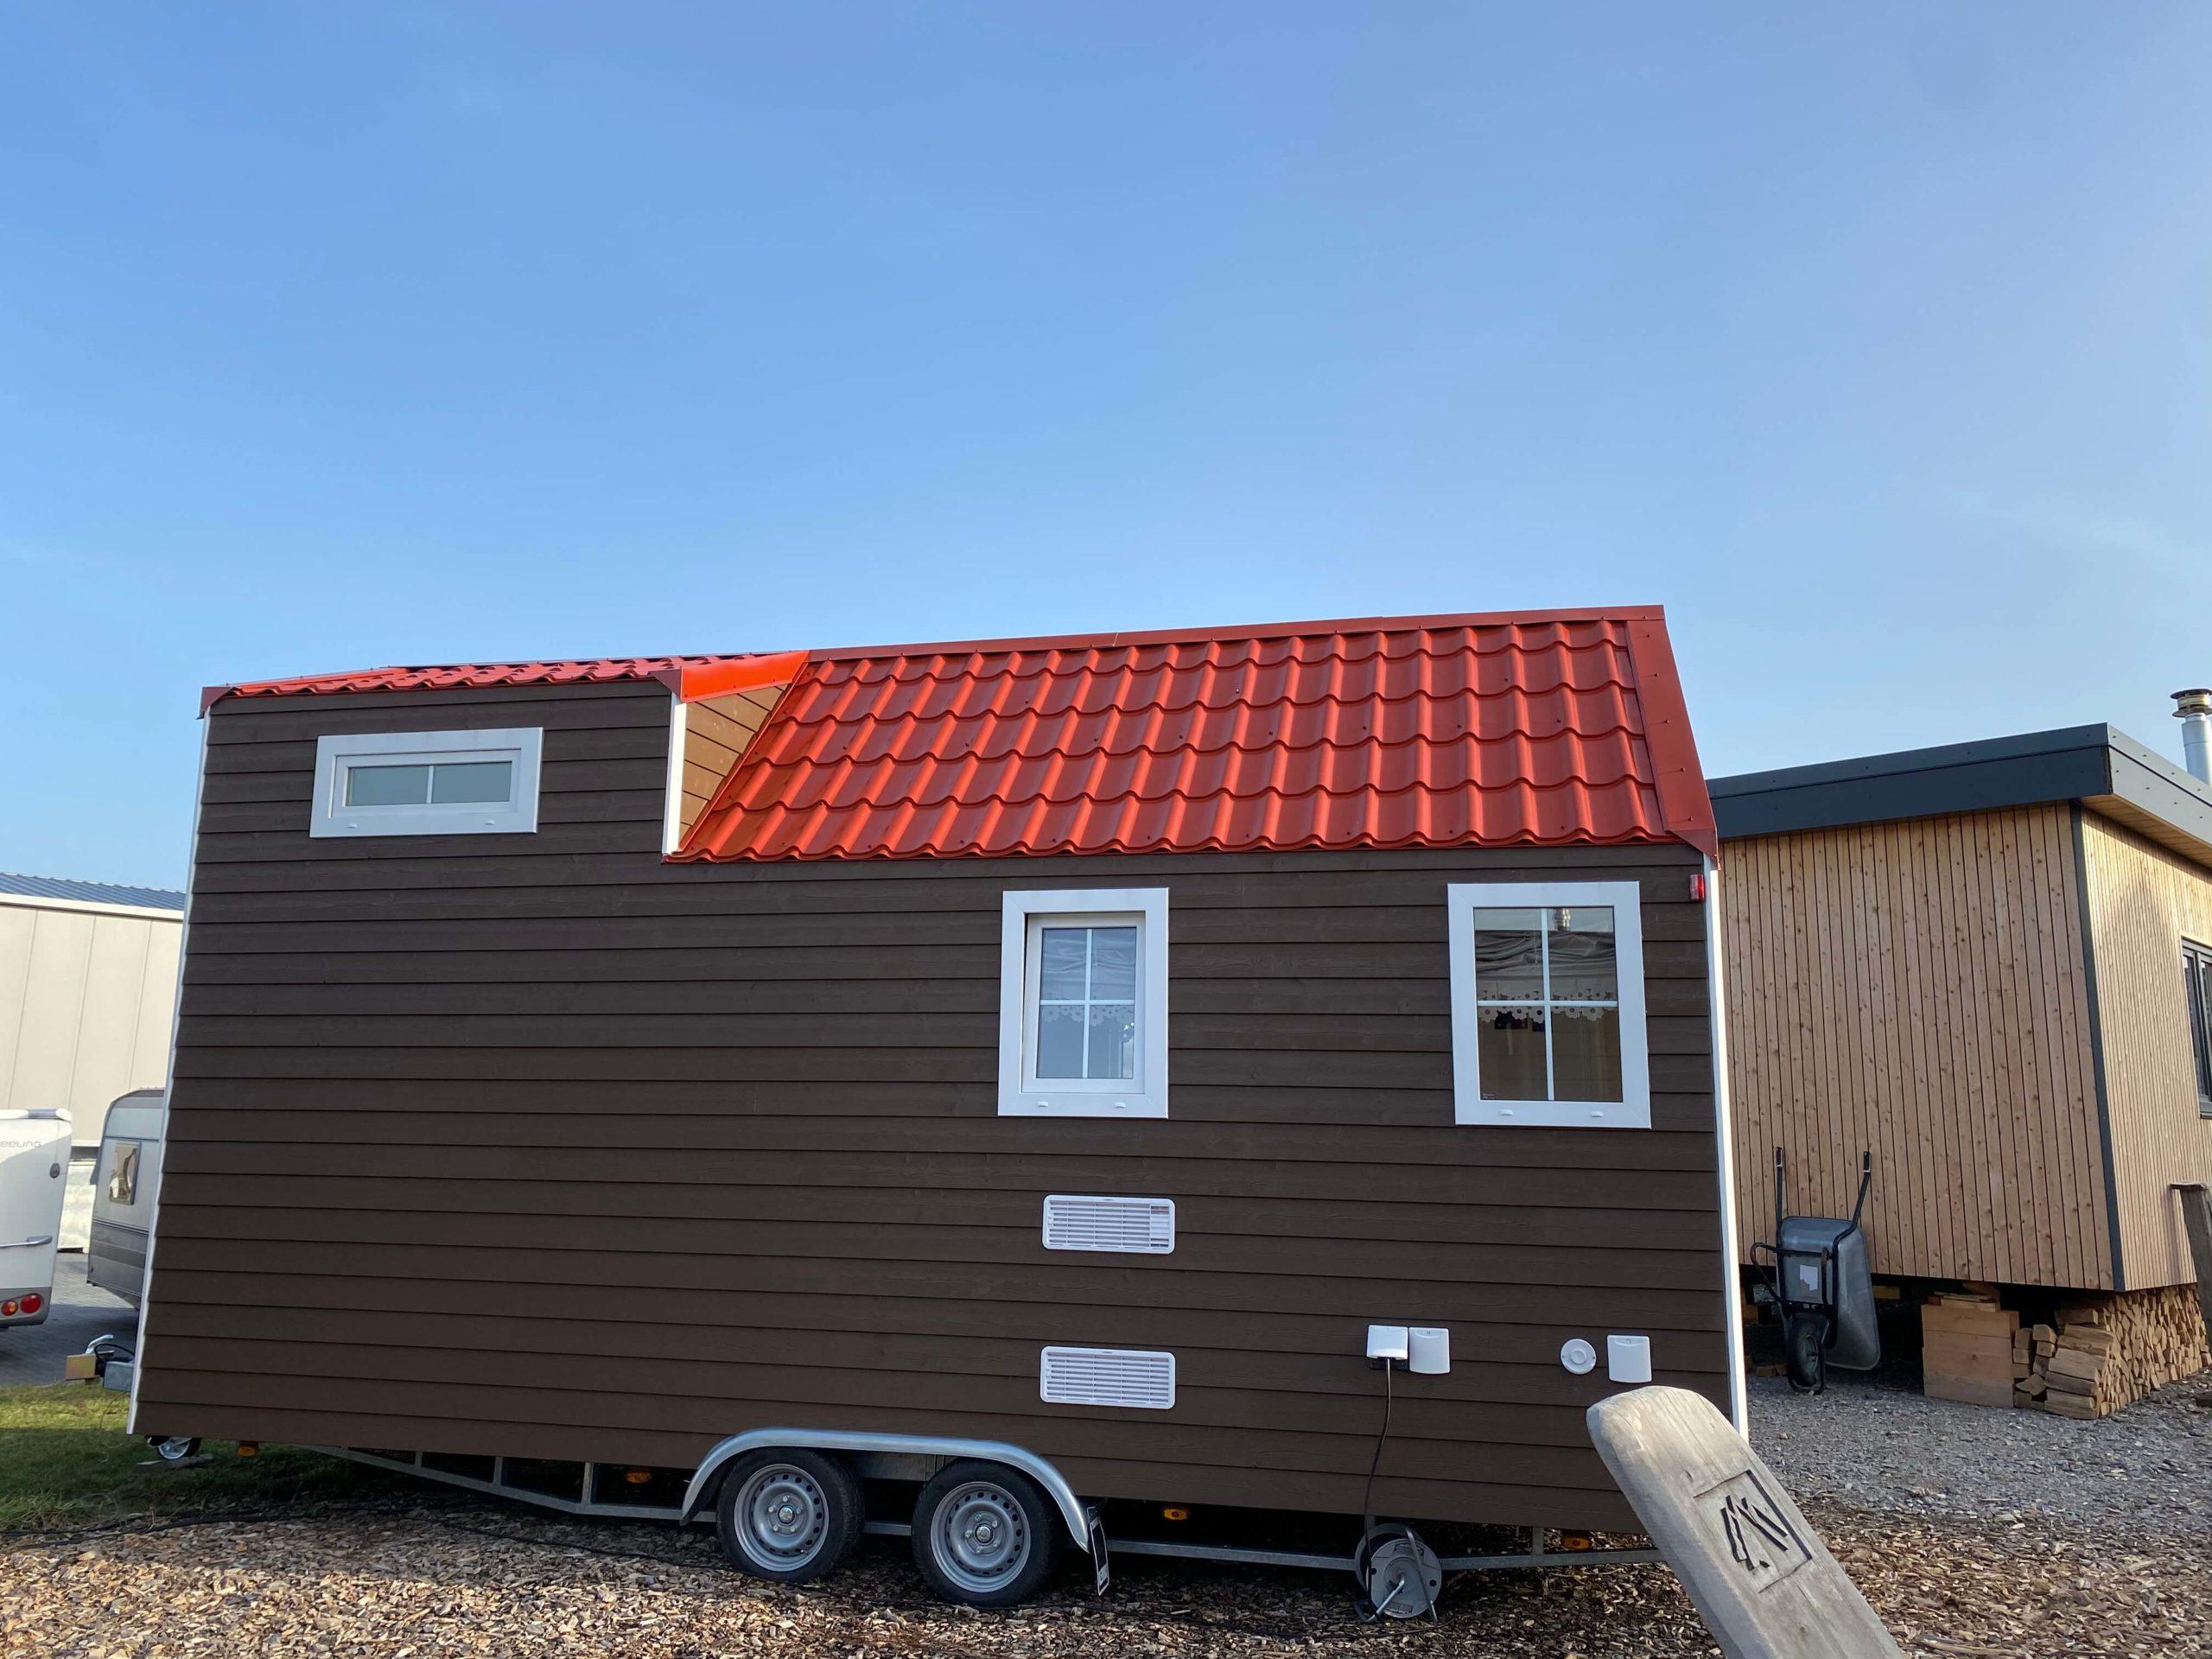 Tiny-House-Frankreich-vital-camp-gmbh02